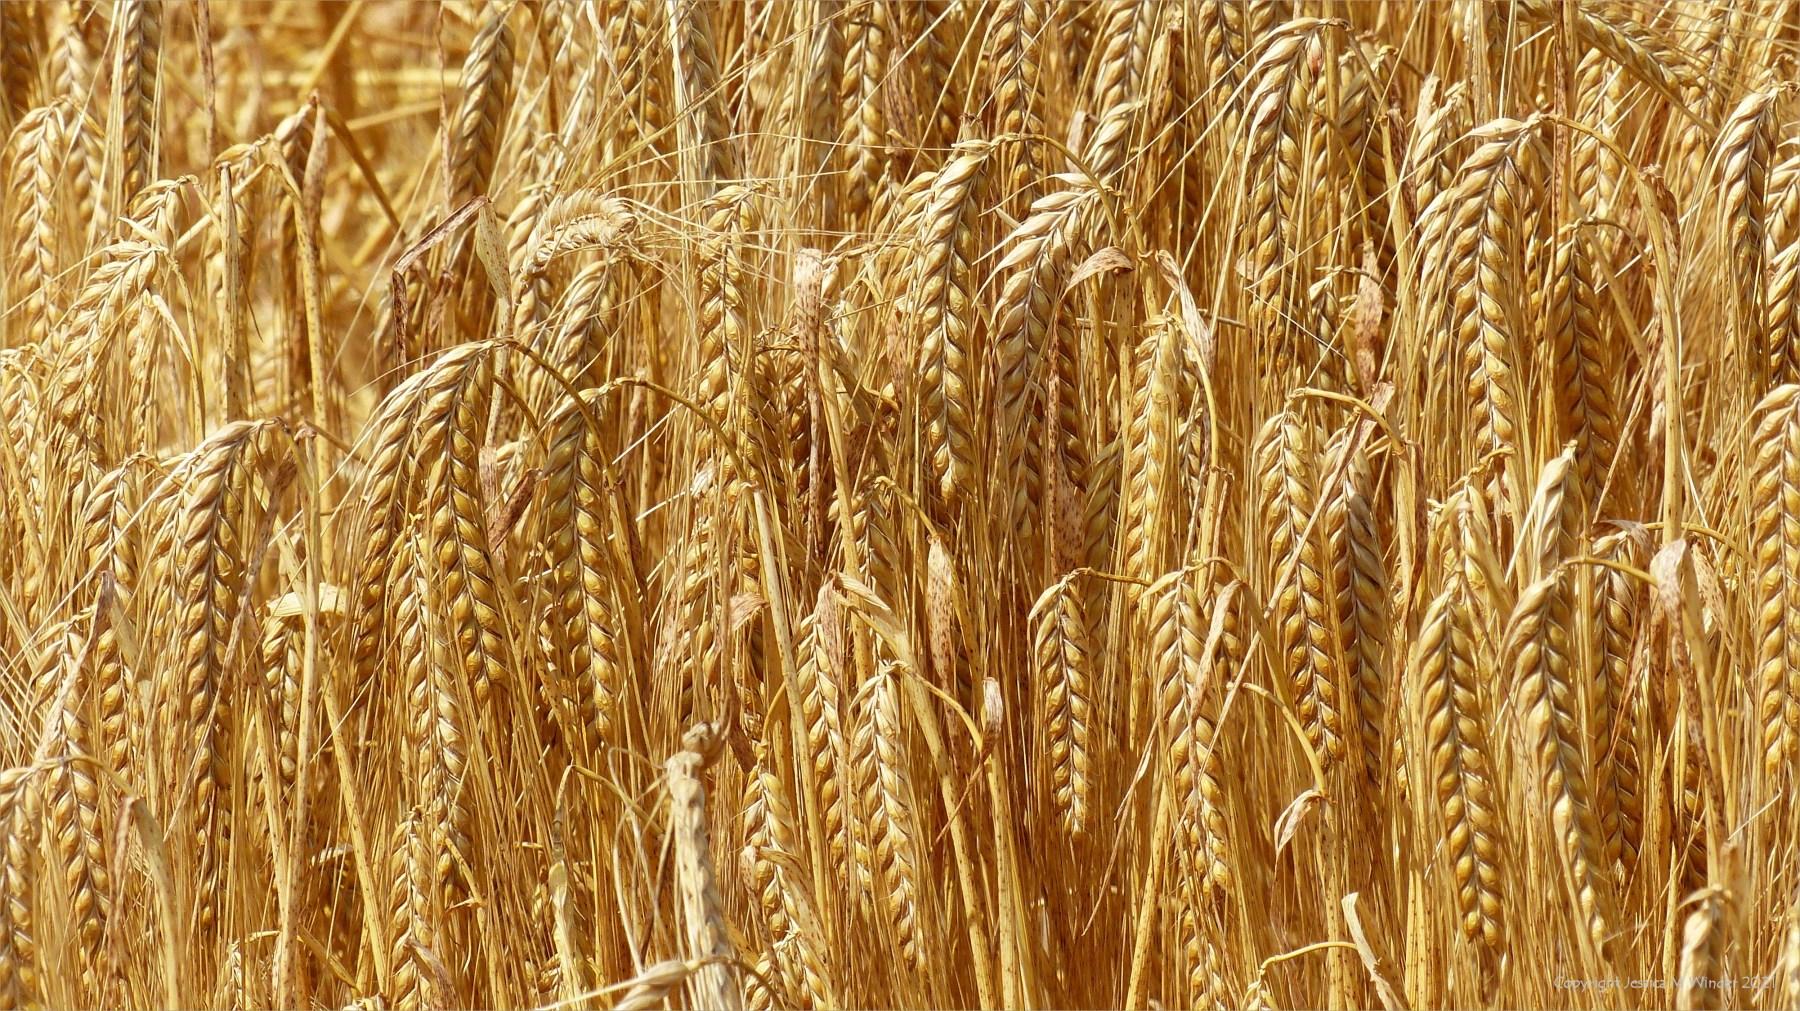 Close-up of ripening golden barley crop